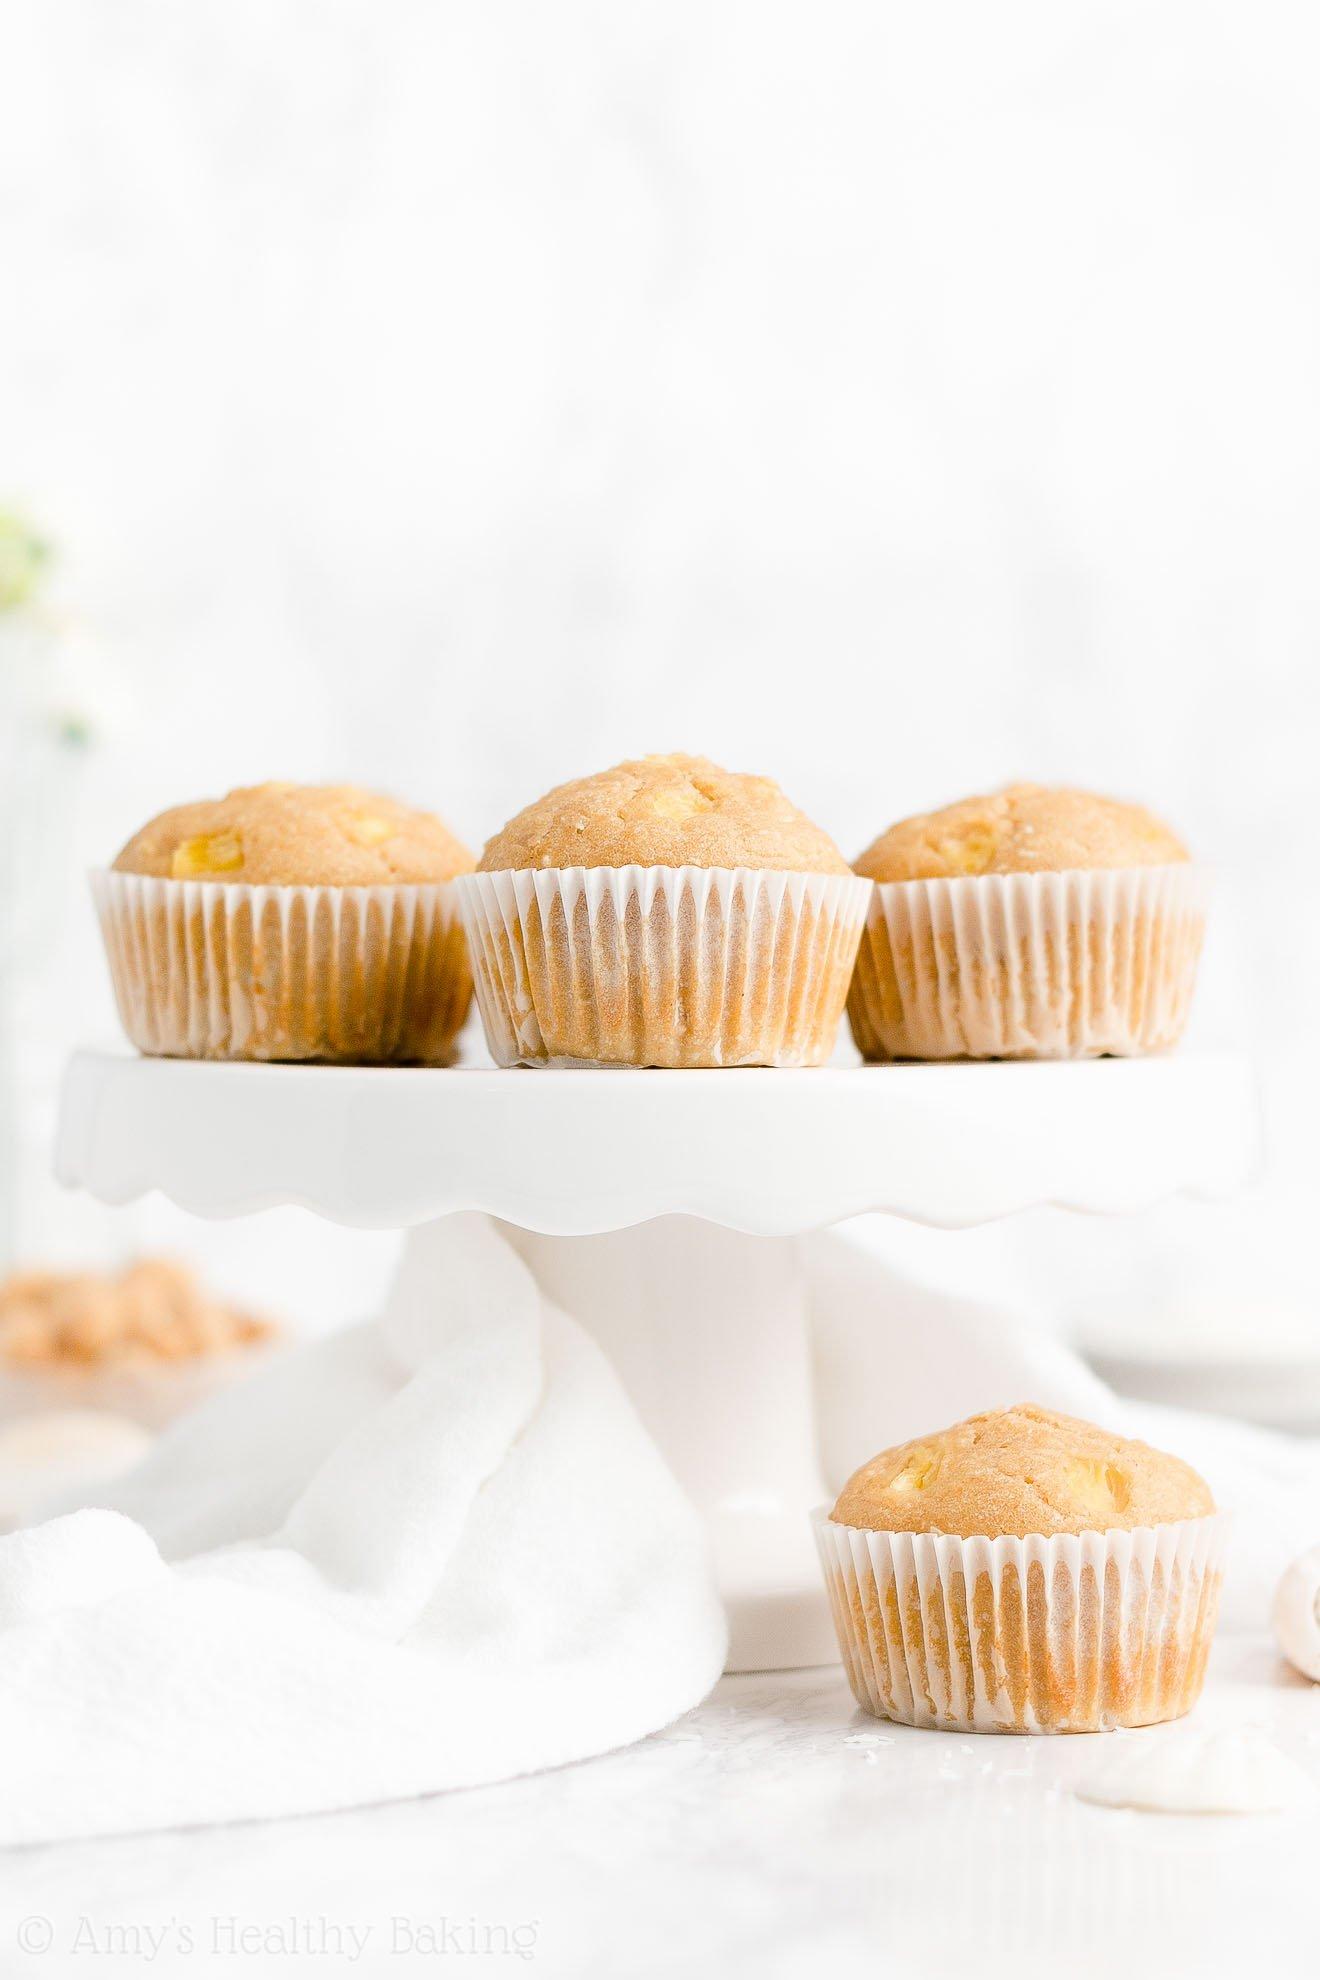 Healthy Tropical Hawaiian Muffins with Pineapple, Coconut & Macadamia Nuts